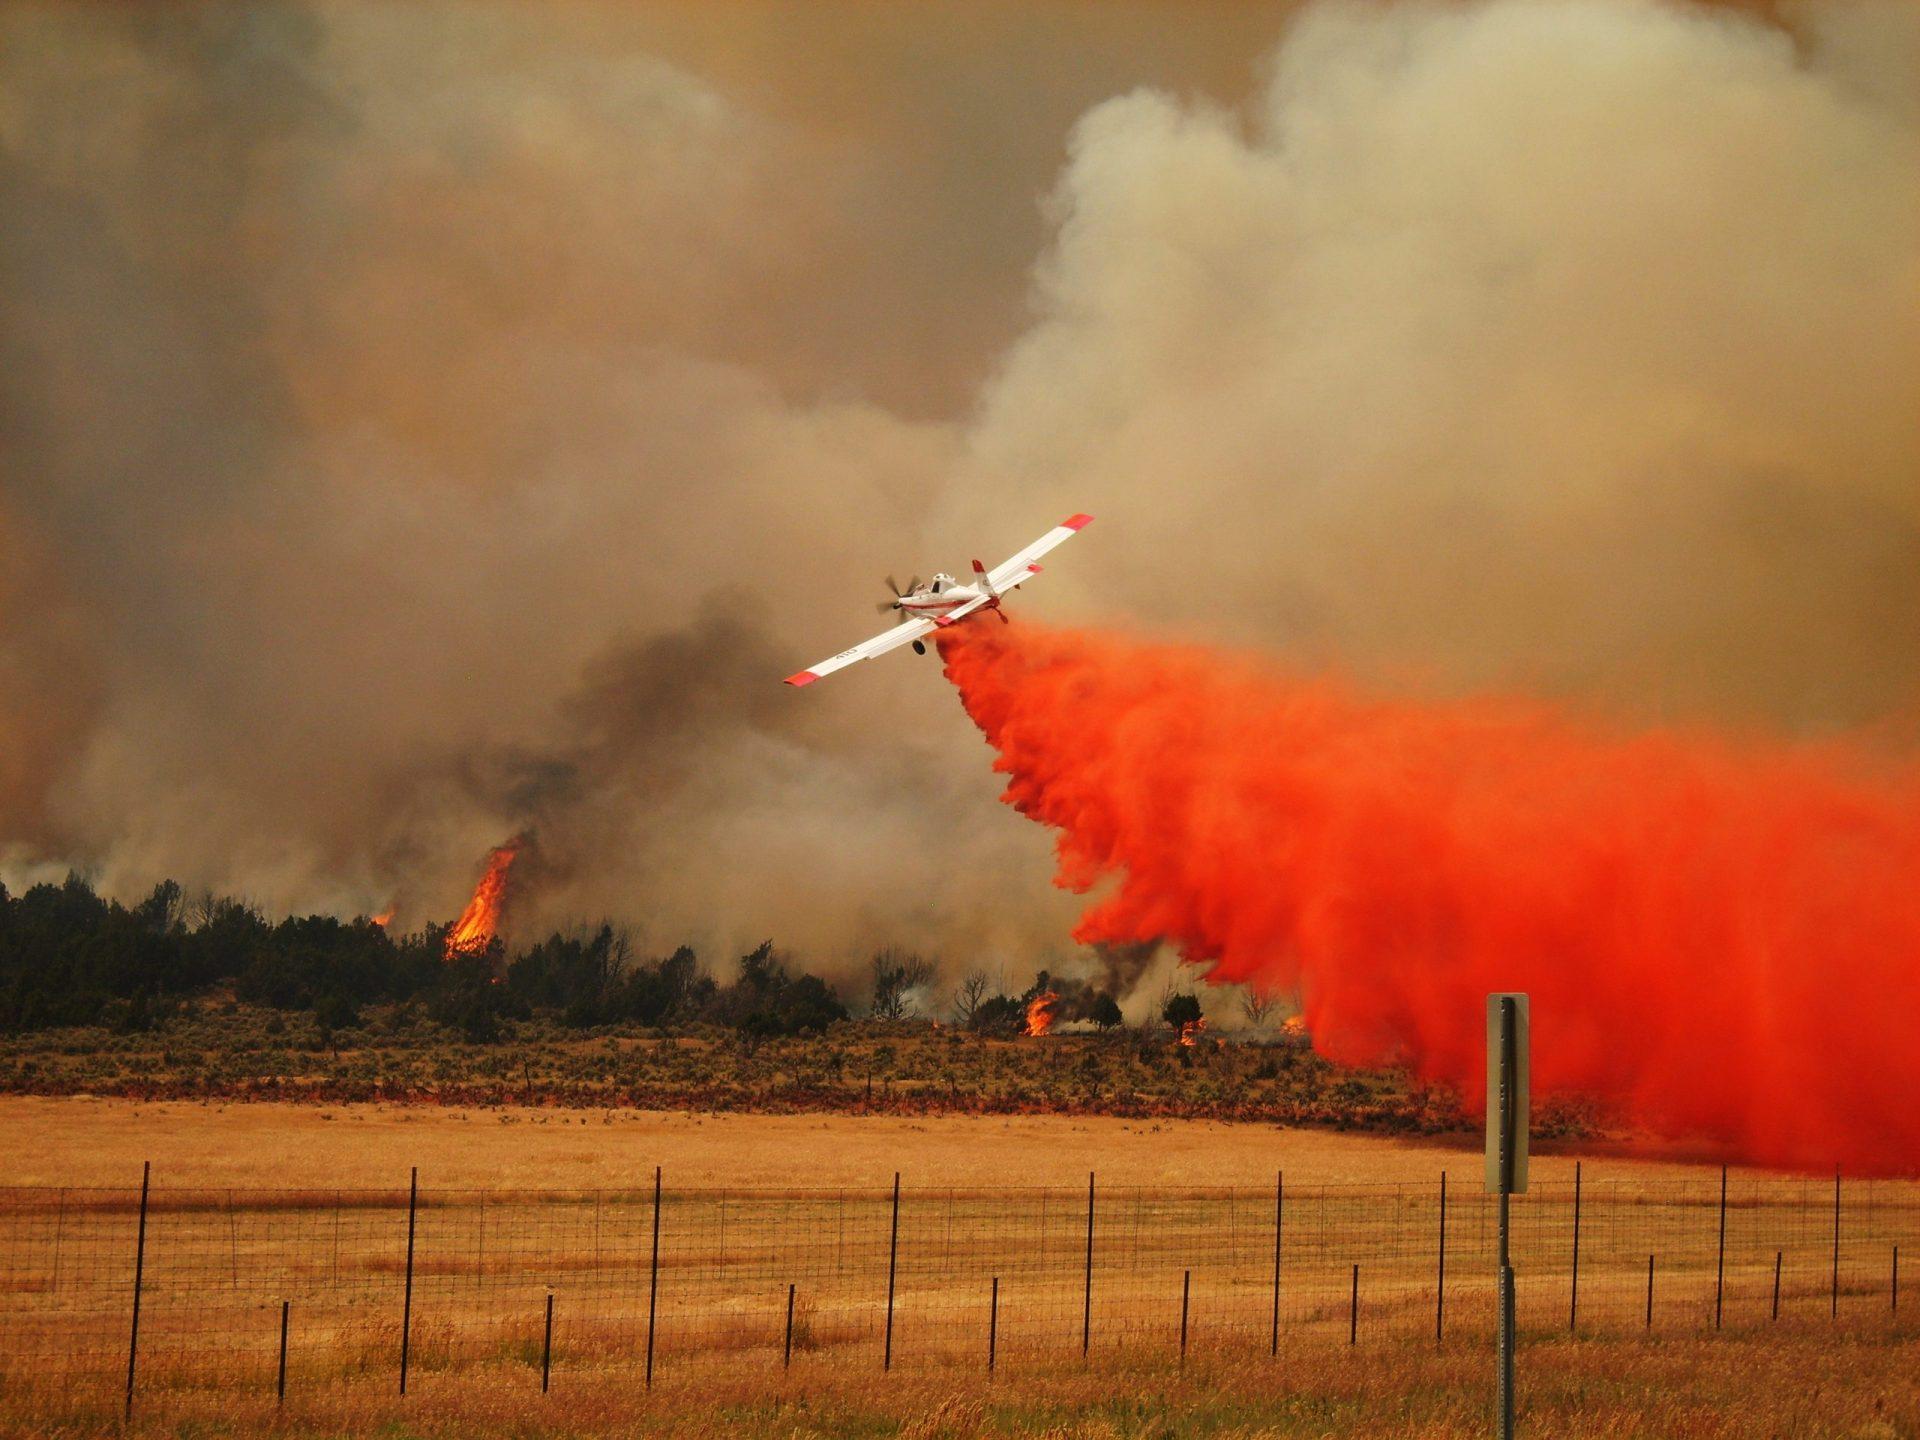 A SEAT drops fire retardant. Image: Keith Hackbarth